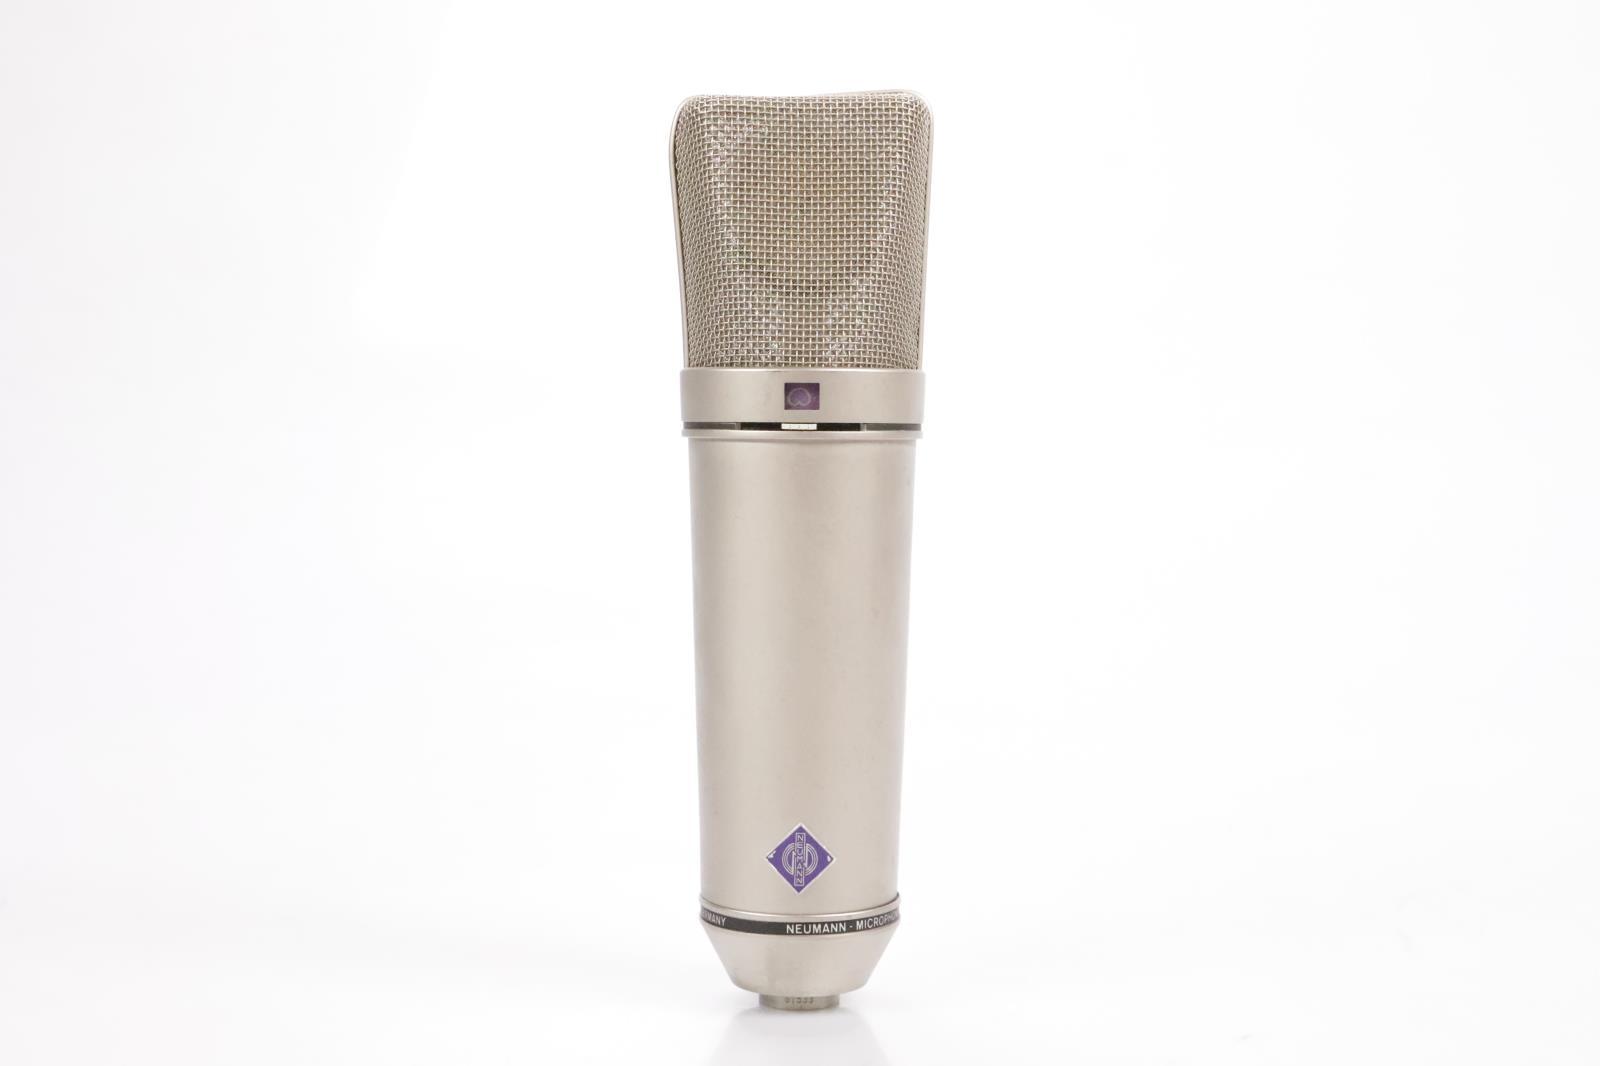 Neumann U 87 Ai Condenser Microphone Mic w/ Case Mogami XLR Cable & Mount #34828